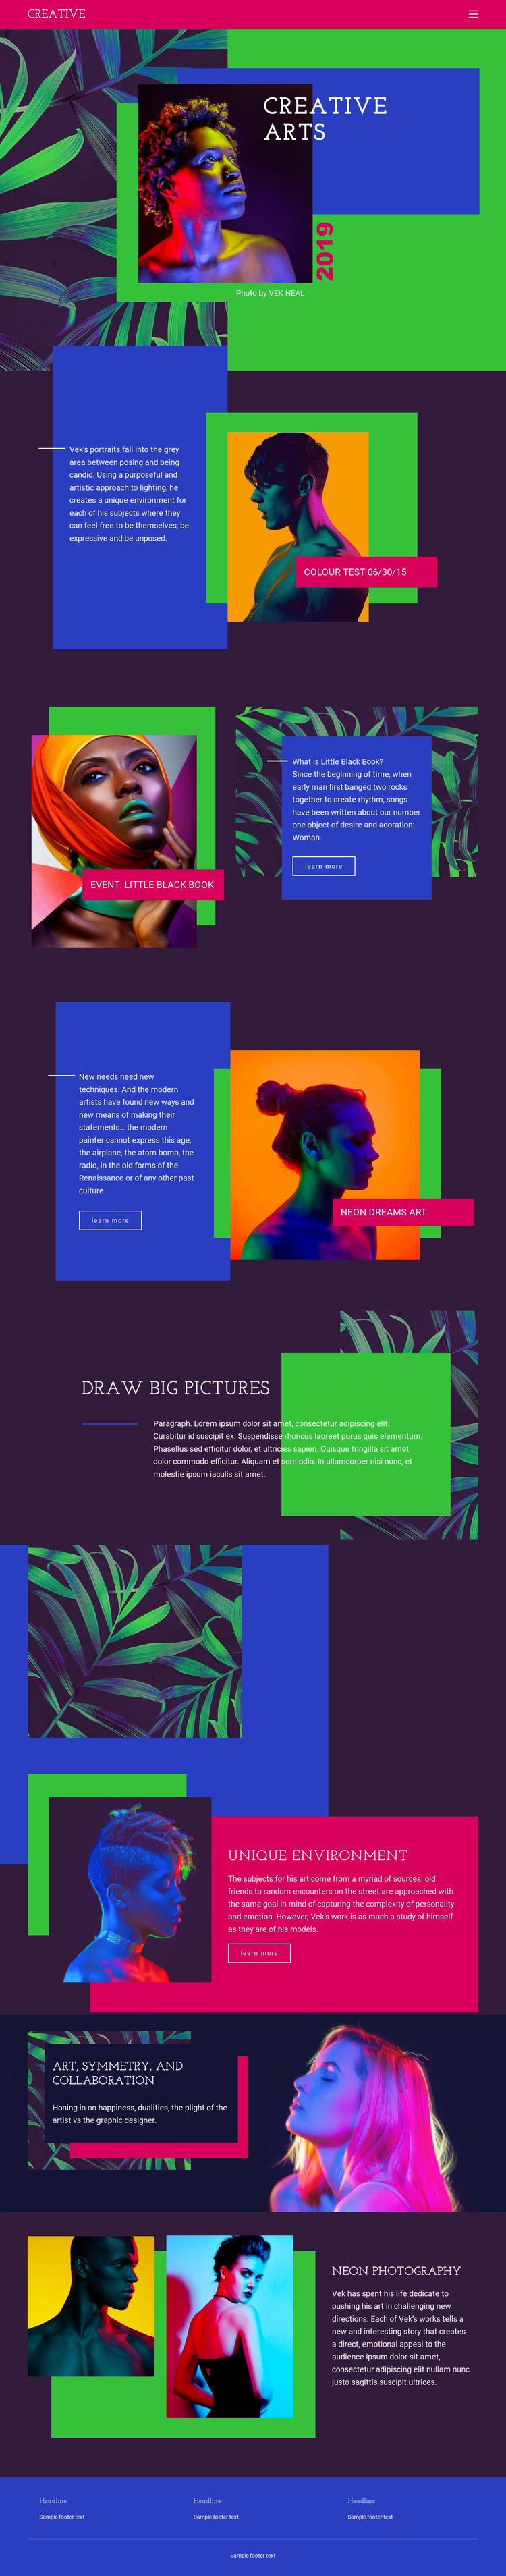 Creative Art Ideas Joomla Template